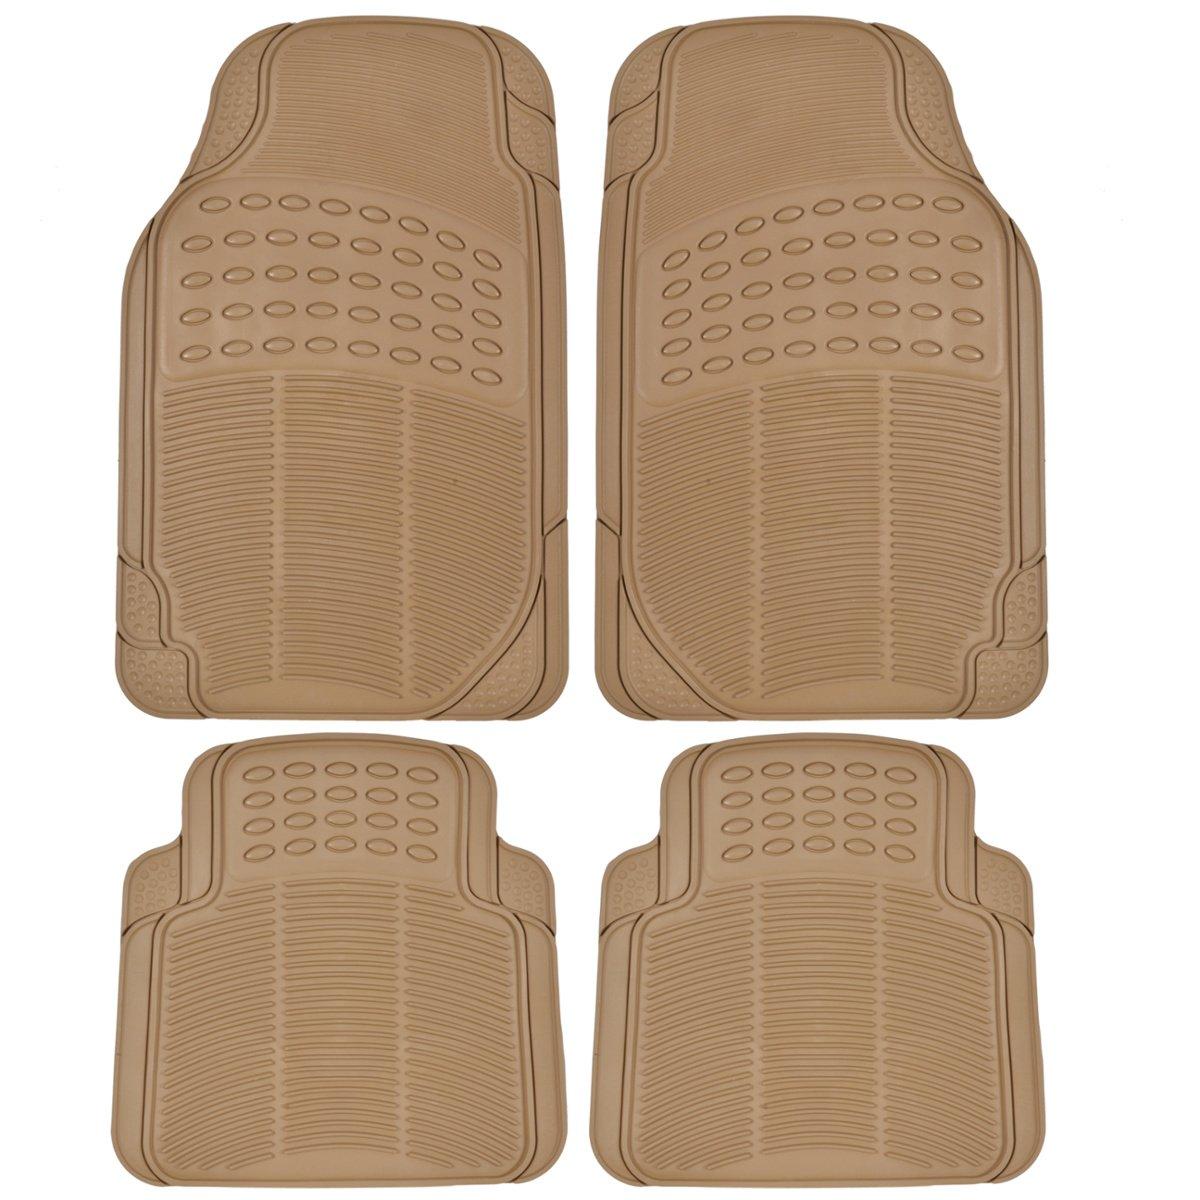 Best Floor Mats Reviews BDK Universal Fit 4-Piece Heavy Duty All Weather Protection Floor Mat - Rubber